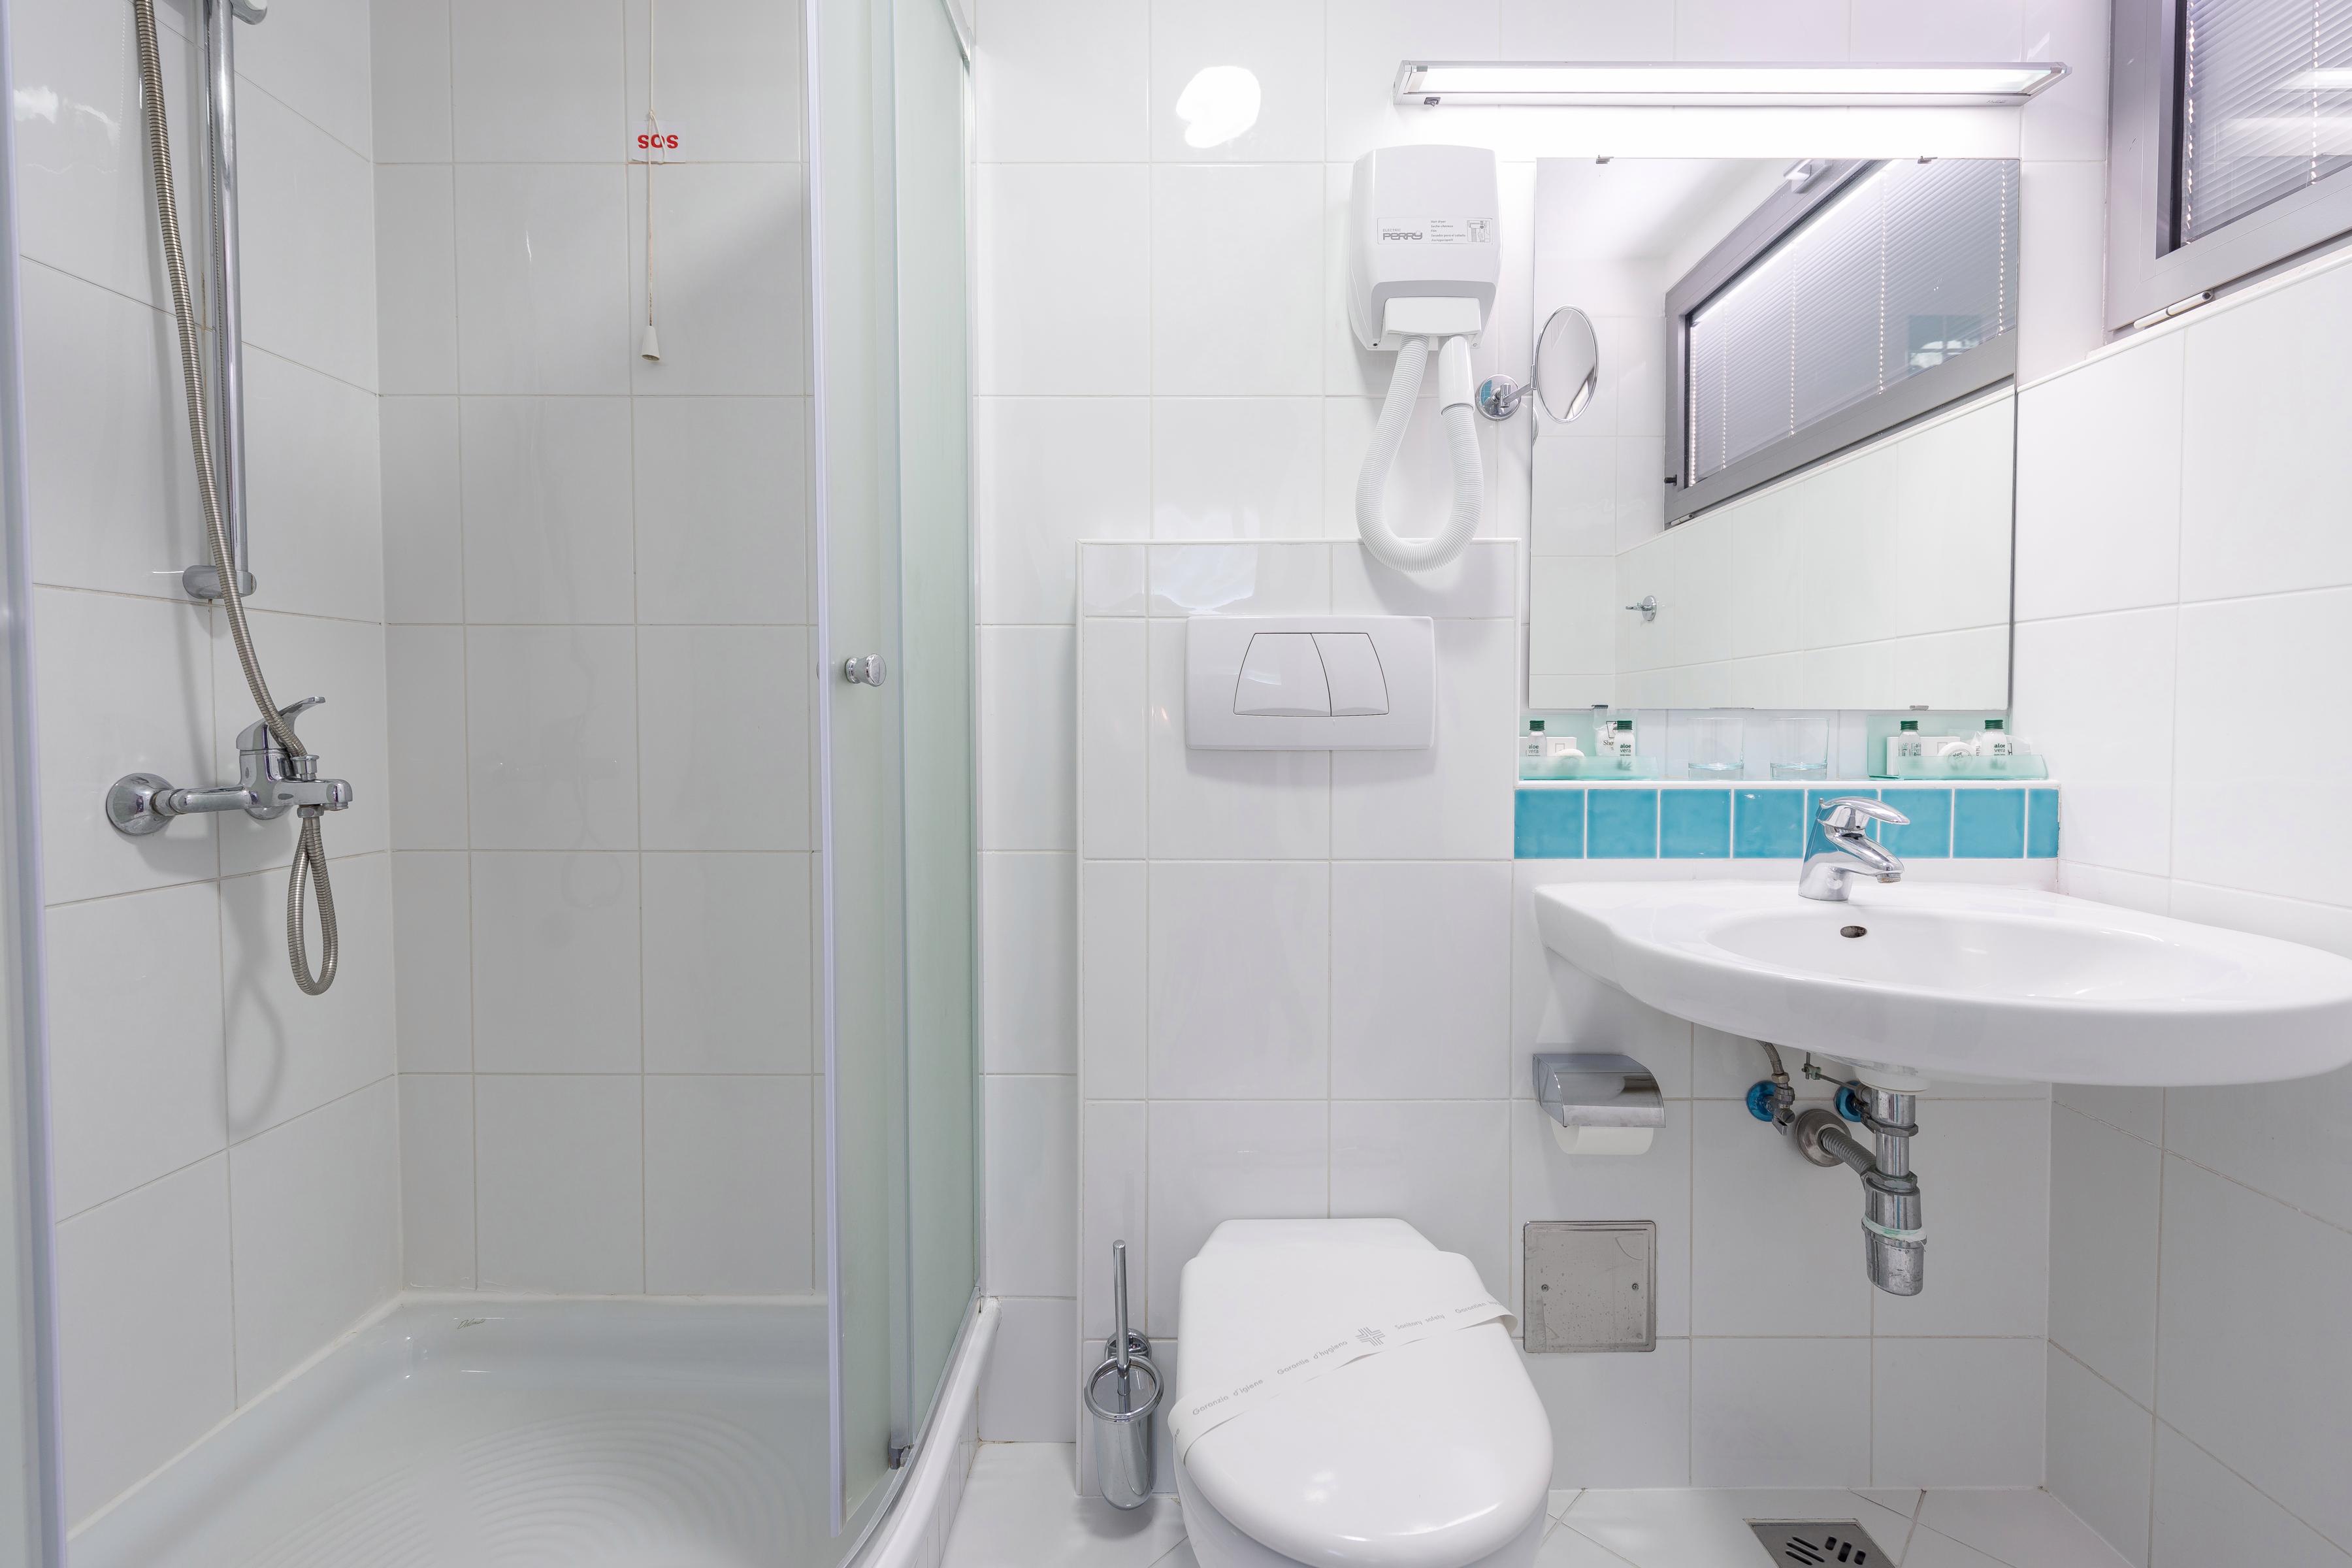 uvlala-hotel-room-bathroom-shower